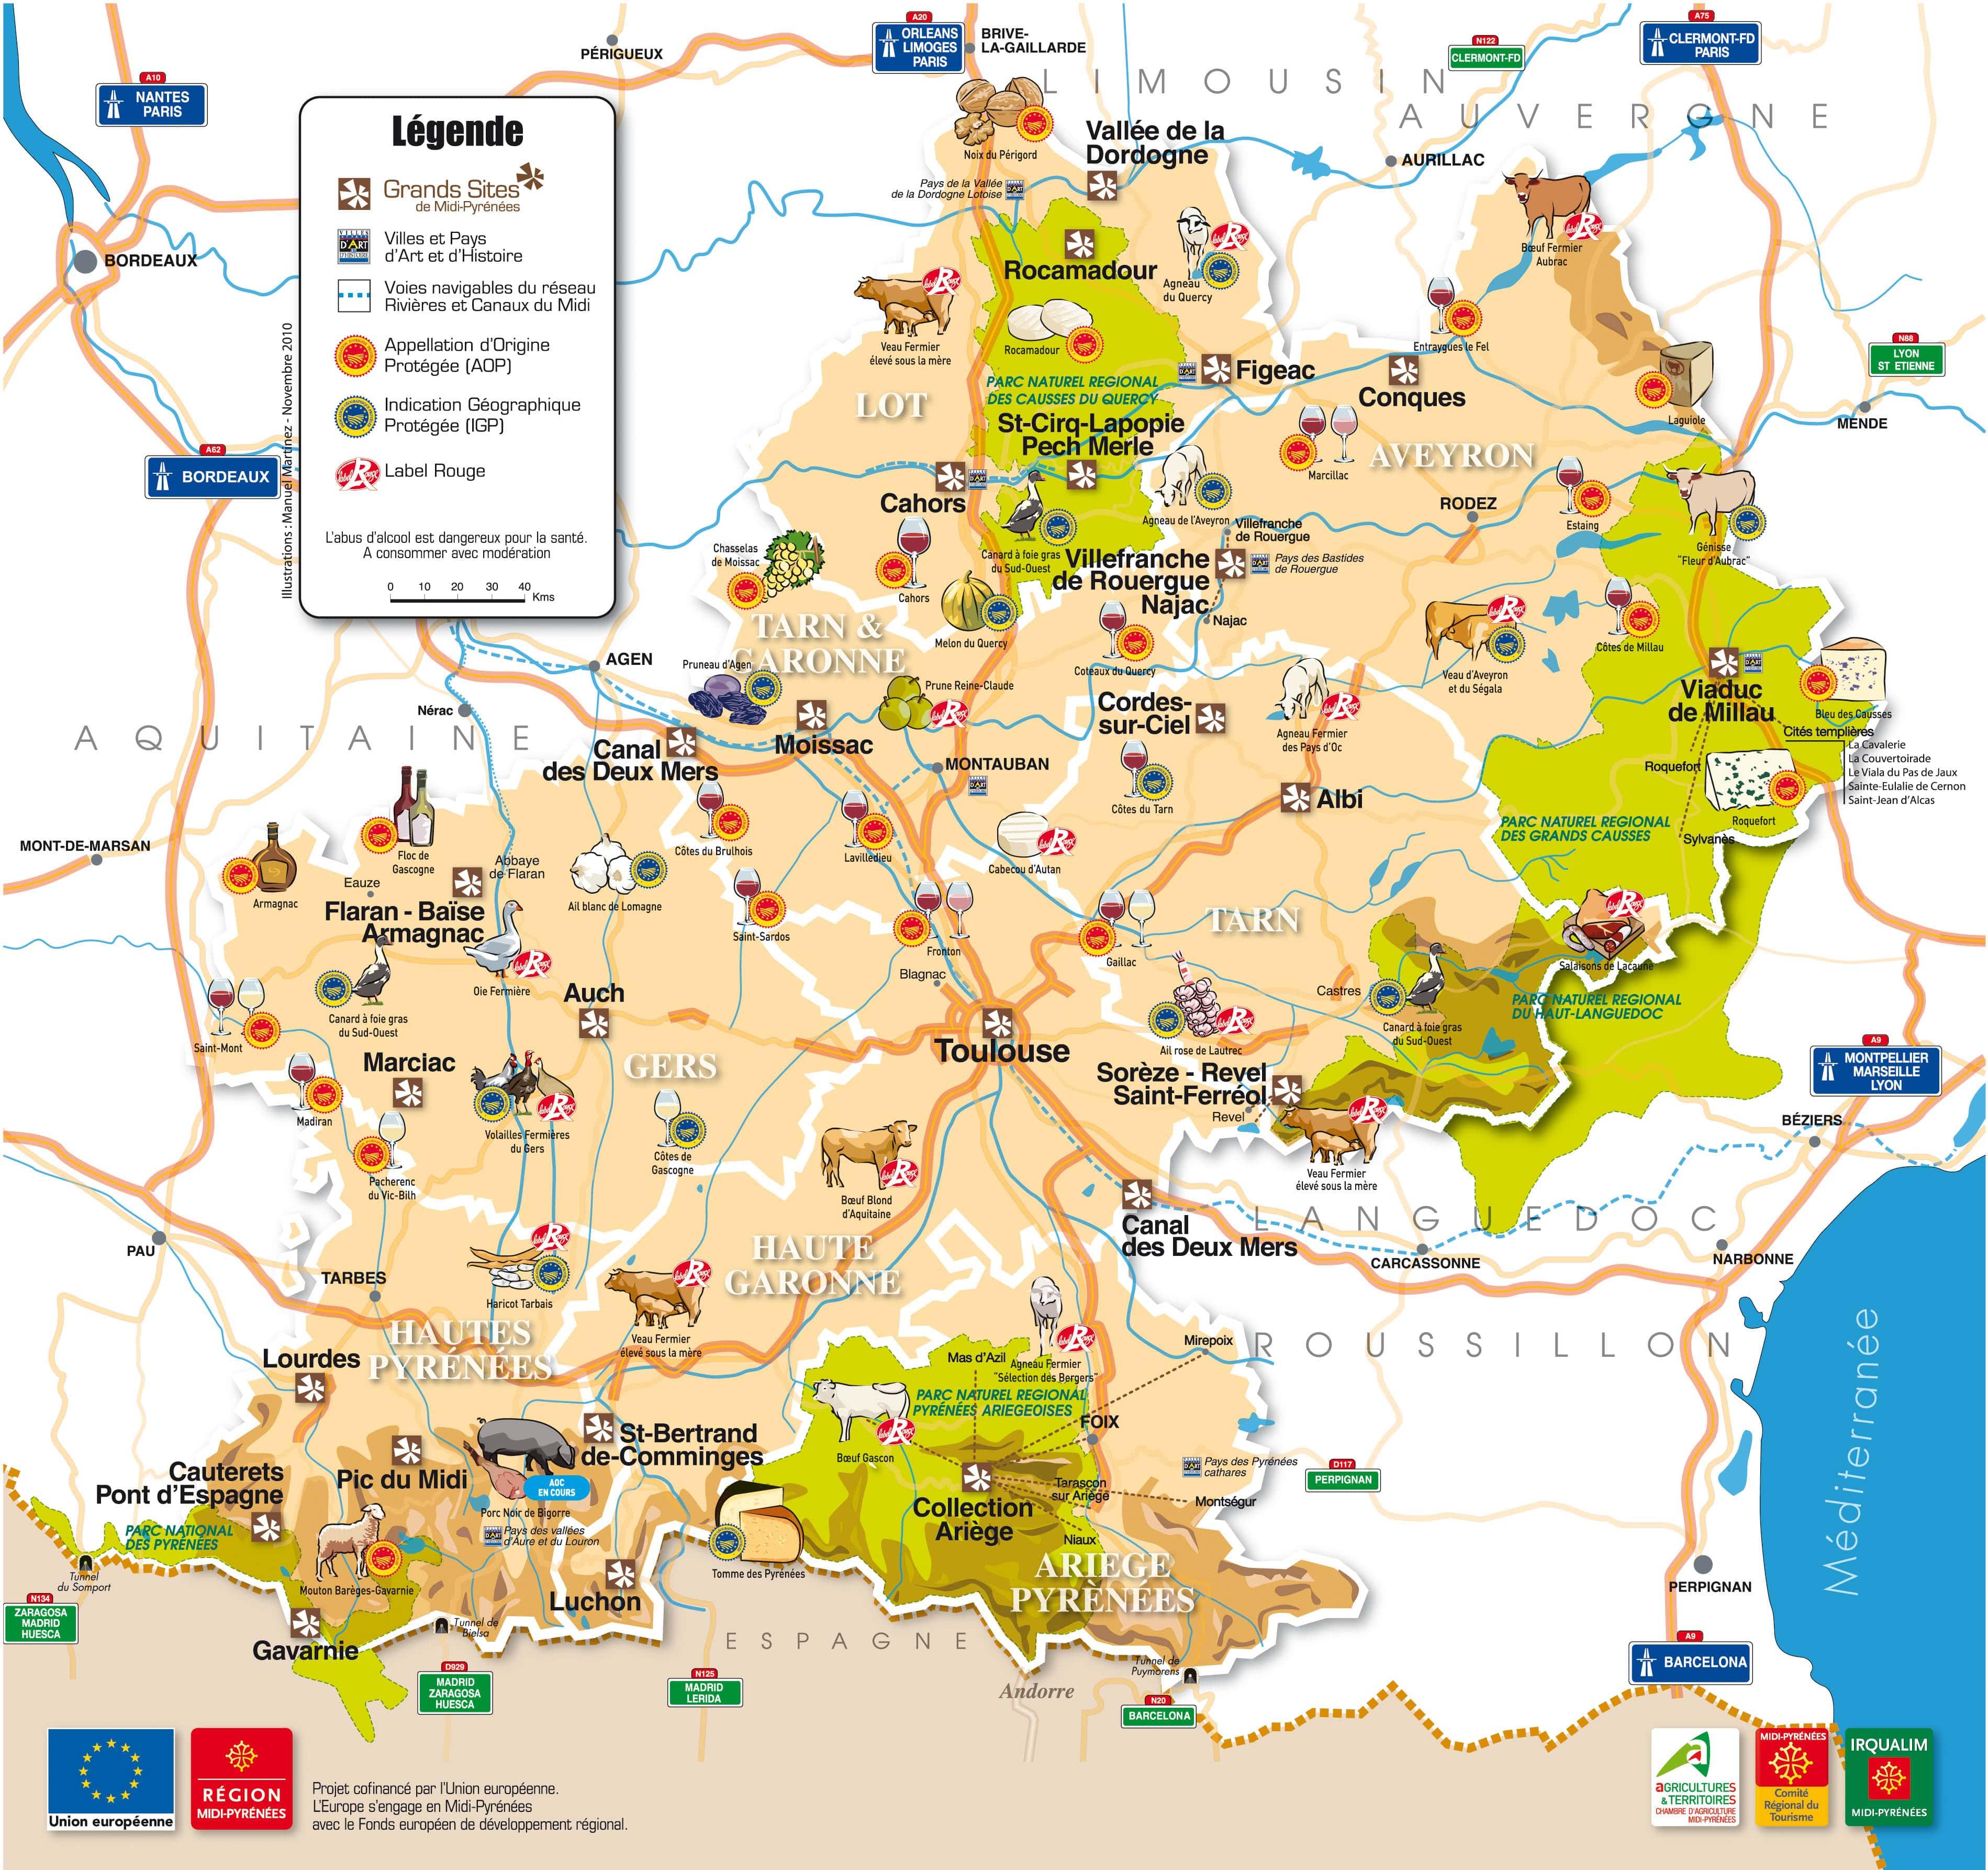 Регион Midi-Pyrénées (Миди-Пиренеи) - достопримечательности, города, что посмотреть, лучшие места, карты, города Франции - путеводитель от FrenchTrip.ru, достопримечательности Франции, France travel guide sights cities best places what to see things to do south France, Rocamadour, Conquesm Autoire, Albi (ЮНЕСКО) Loubressac, Saint-Cirq-Lapopie, Montauban, Тулуза, Auch, Larressingle, Mirepoix, Кафедральный собор в Алби (ЮНЕСКО) Millau Viaduct, Millau Sanctuaires de Lourdes Каньон Ariege, Niaux Lac de Gaube, Cauterets Cirque de Gavarnie, Gavarnie Пещеры Niaux, Tarascon-sur-Ariege Grotte du Pech-Merle, Cabrerets Chateau de Montsegur, Montsegur Abbatiale Sainte-Foy, Conques Зоопарк - Parc Animalier des Pyrenees, Ayzac-Ost Basilique Saint-Sernin, Toulouse Chateau de Cenevieres, Cenevieres Conques Chateau Belcastel, Belcastel Basilique St-Sauveur, Rocamadour Pont Valentre, Cahors